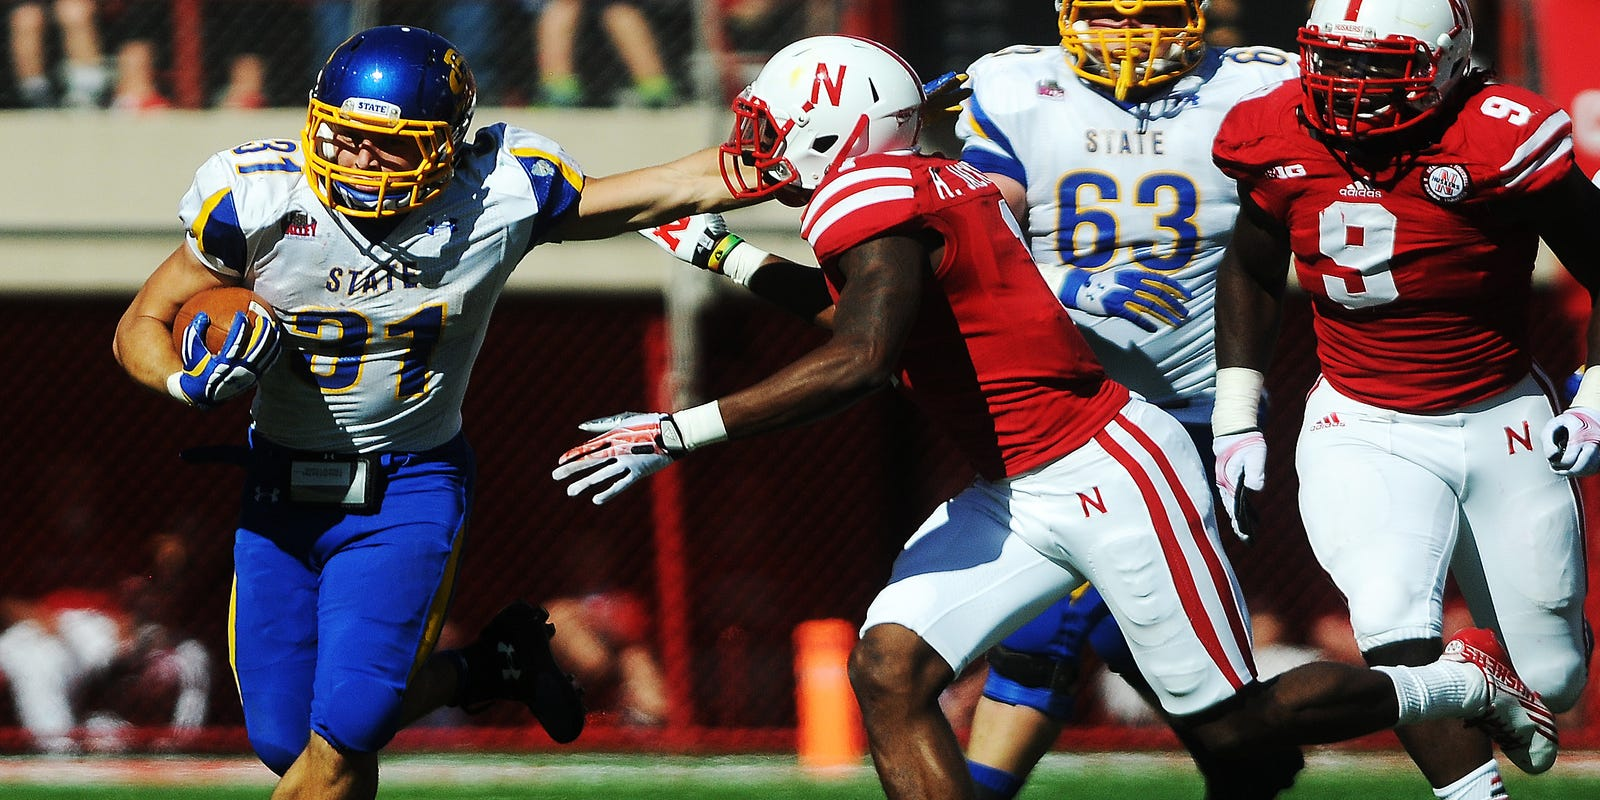 South Dakota State Football To Play Nebraska Cornhuskers In